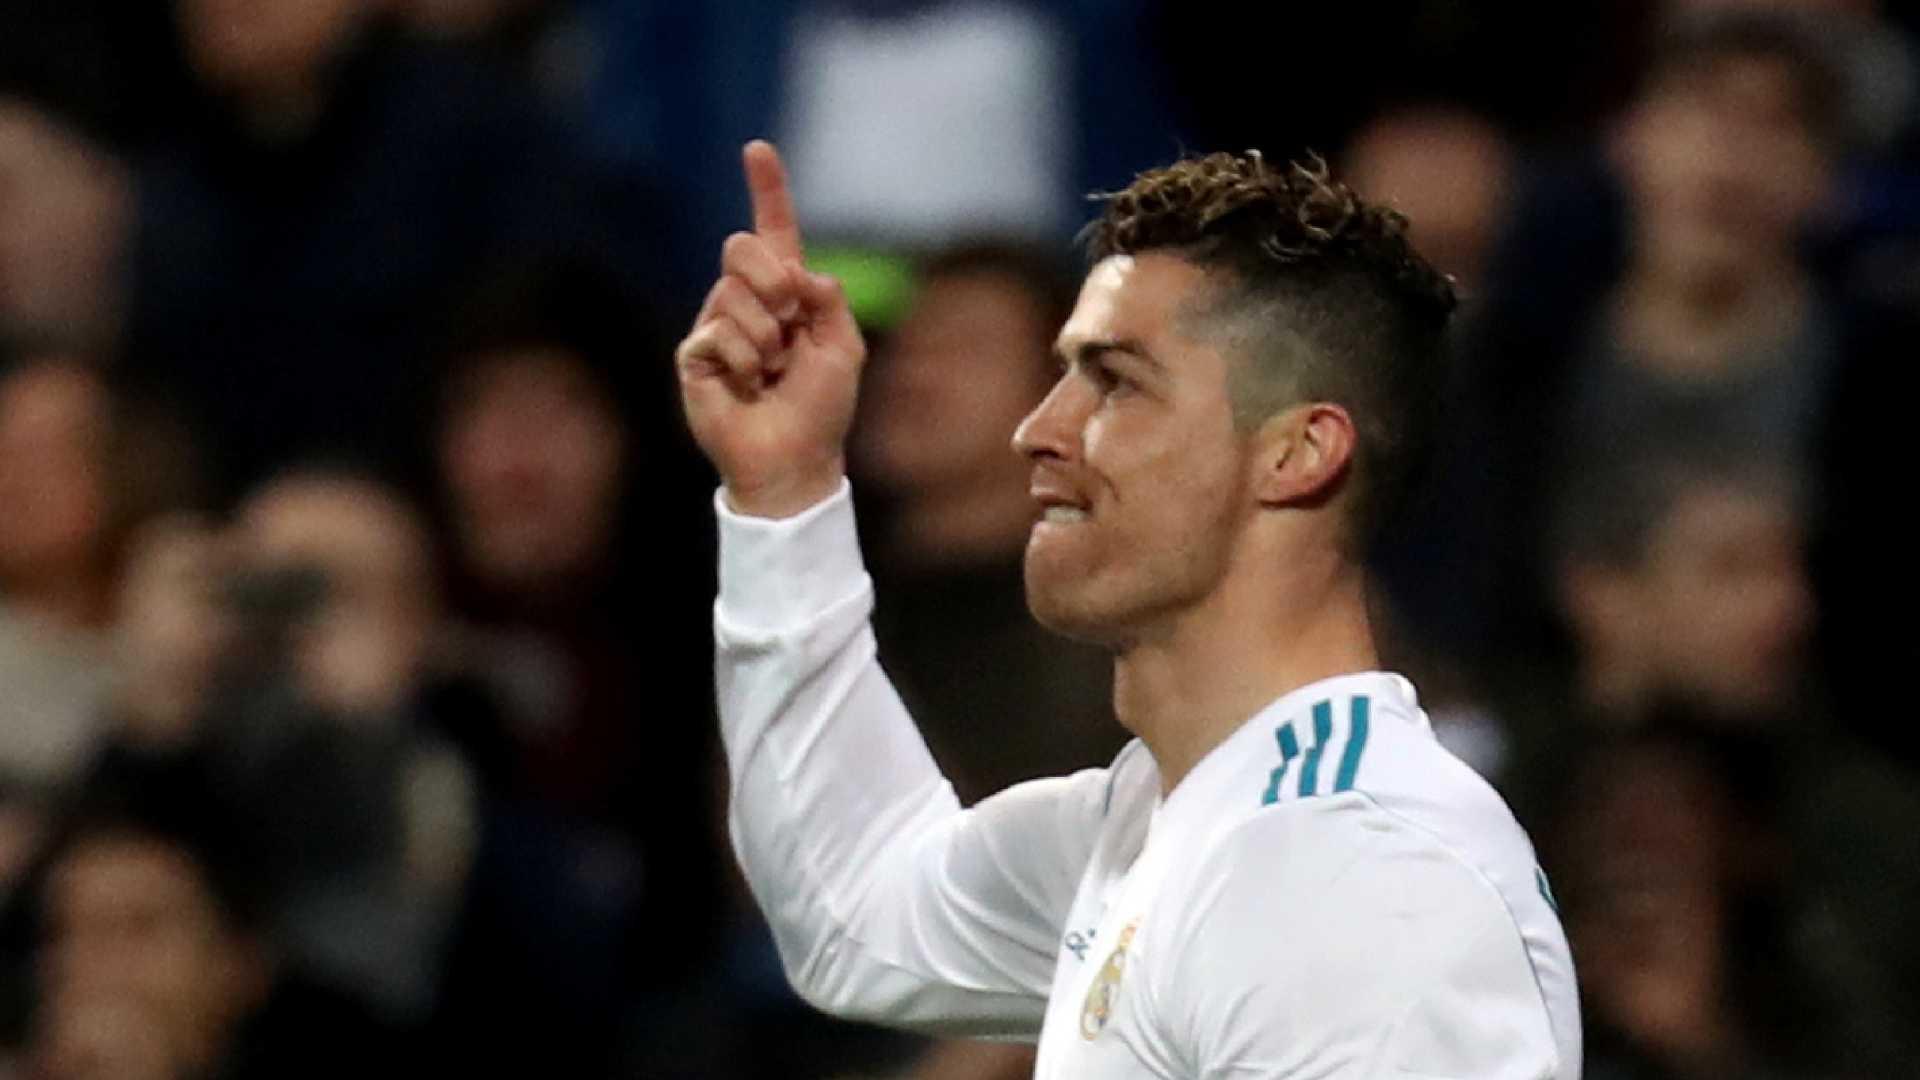 o hábito de ronaldo que deixa os colegas no real madrid a rir - CR7 - O hábito de Ronaldo que deixa os colegas no Real Madrid a rir